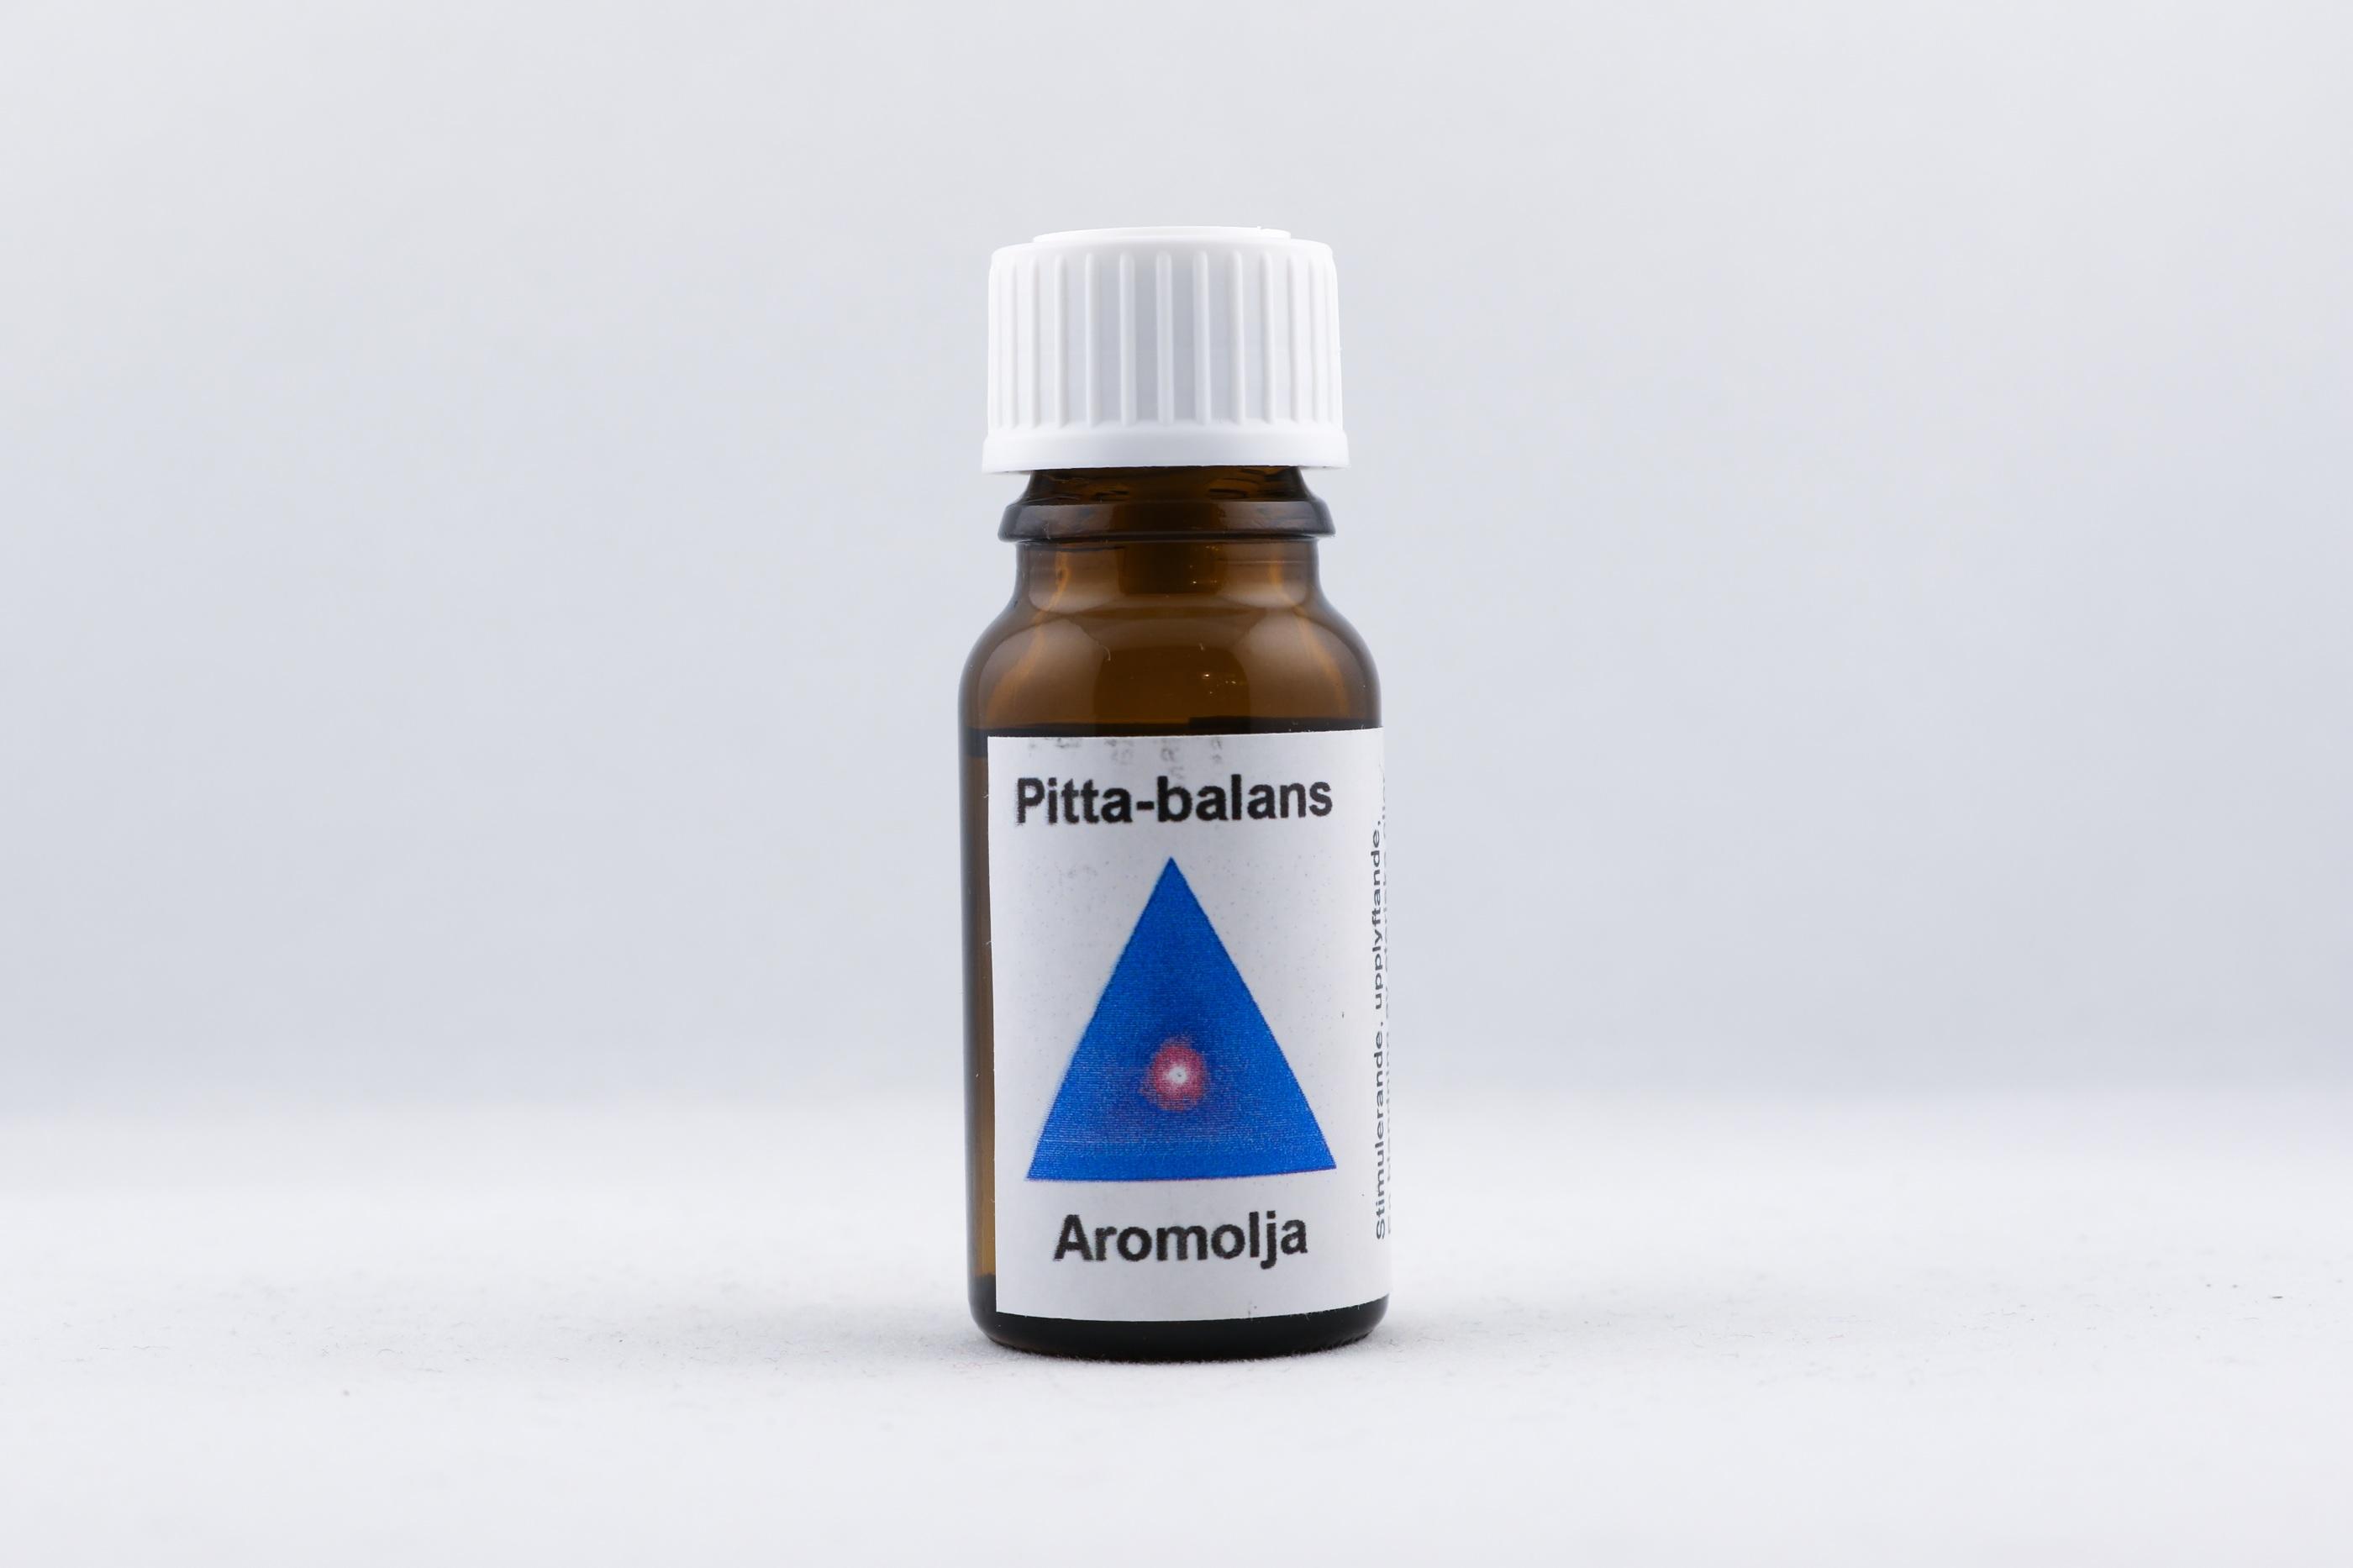 Pitta-balans eterisk olja wellness ayurveda halmstad sweden svensk eterisk aroma olja